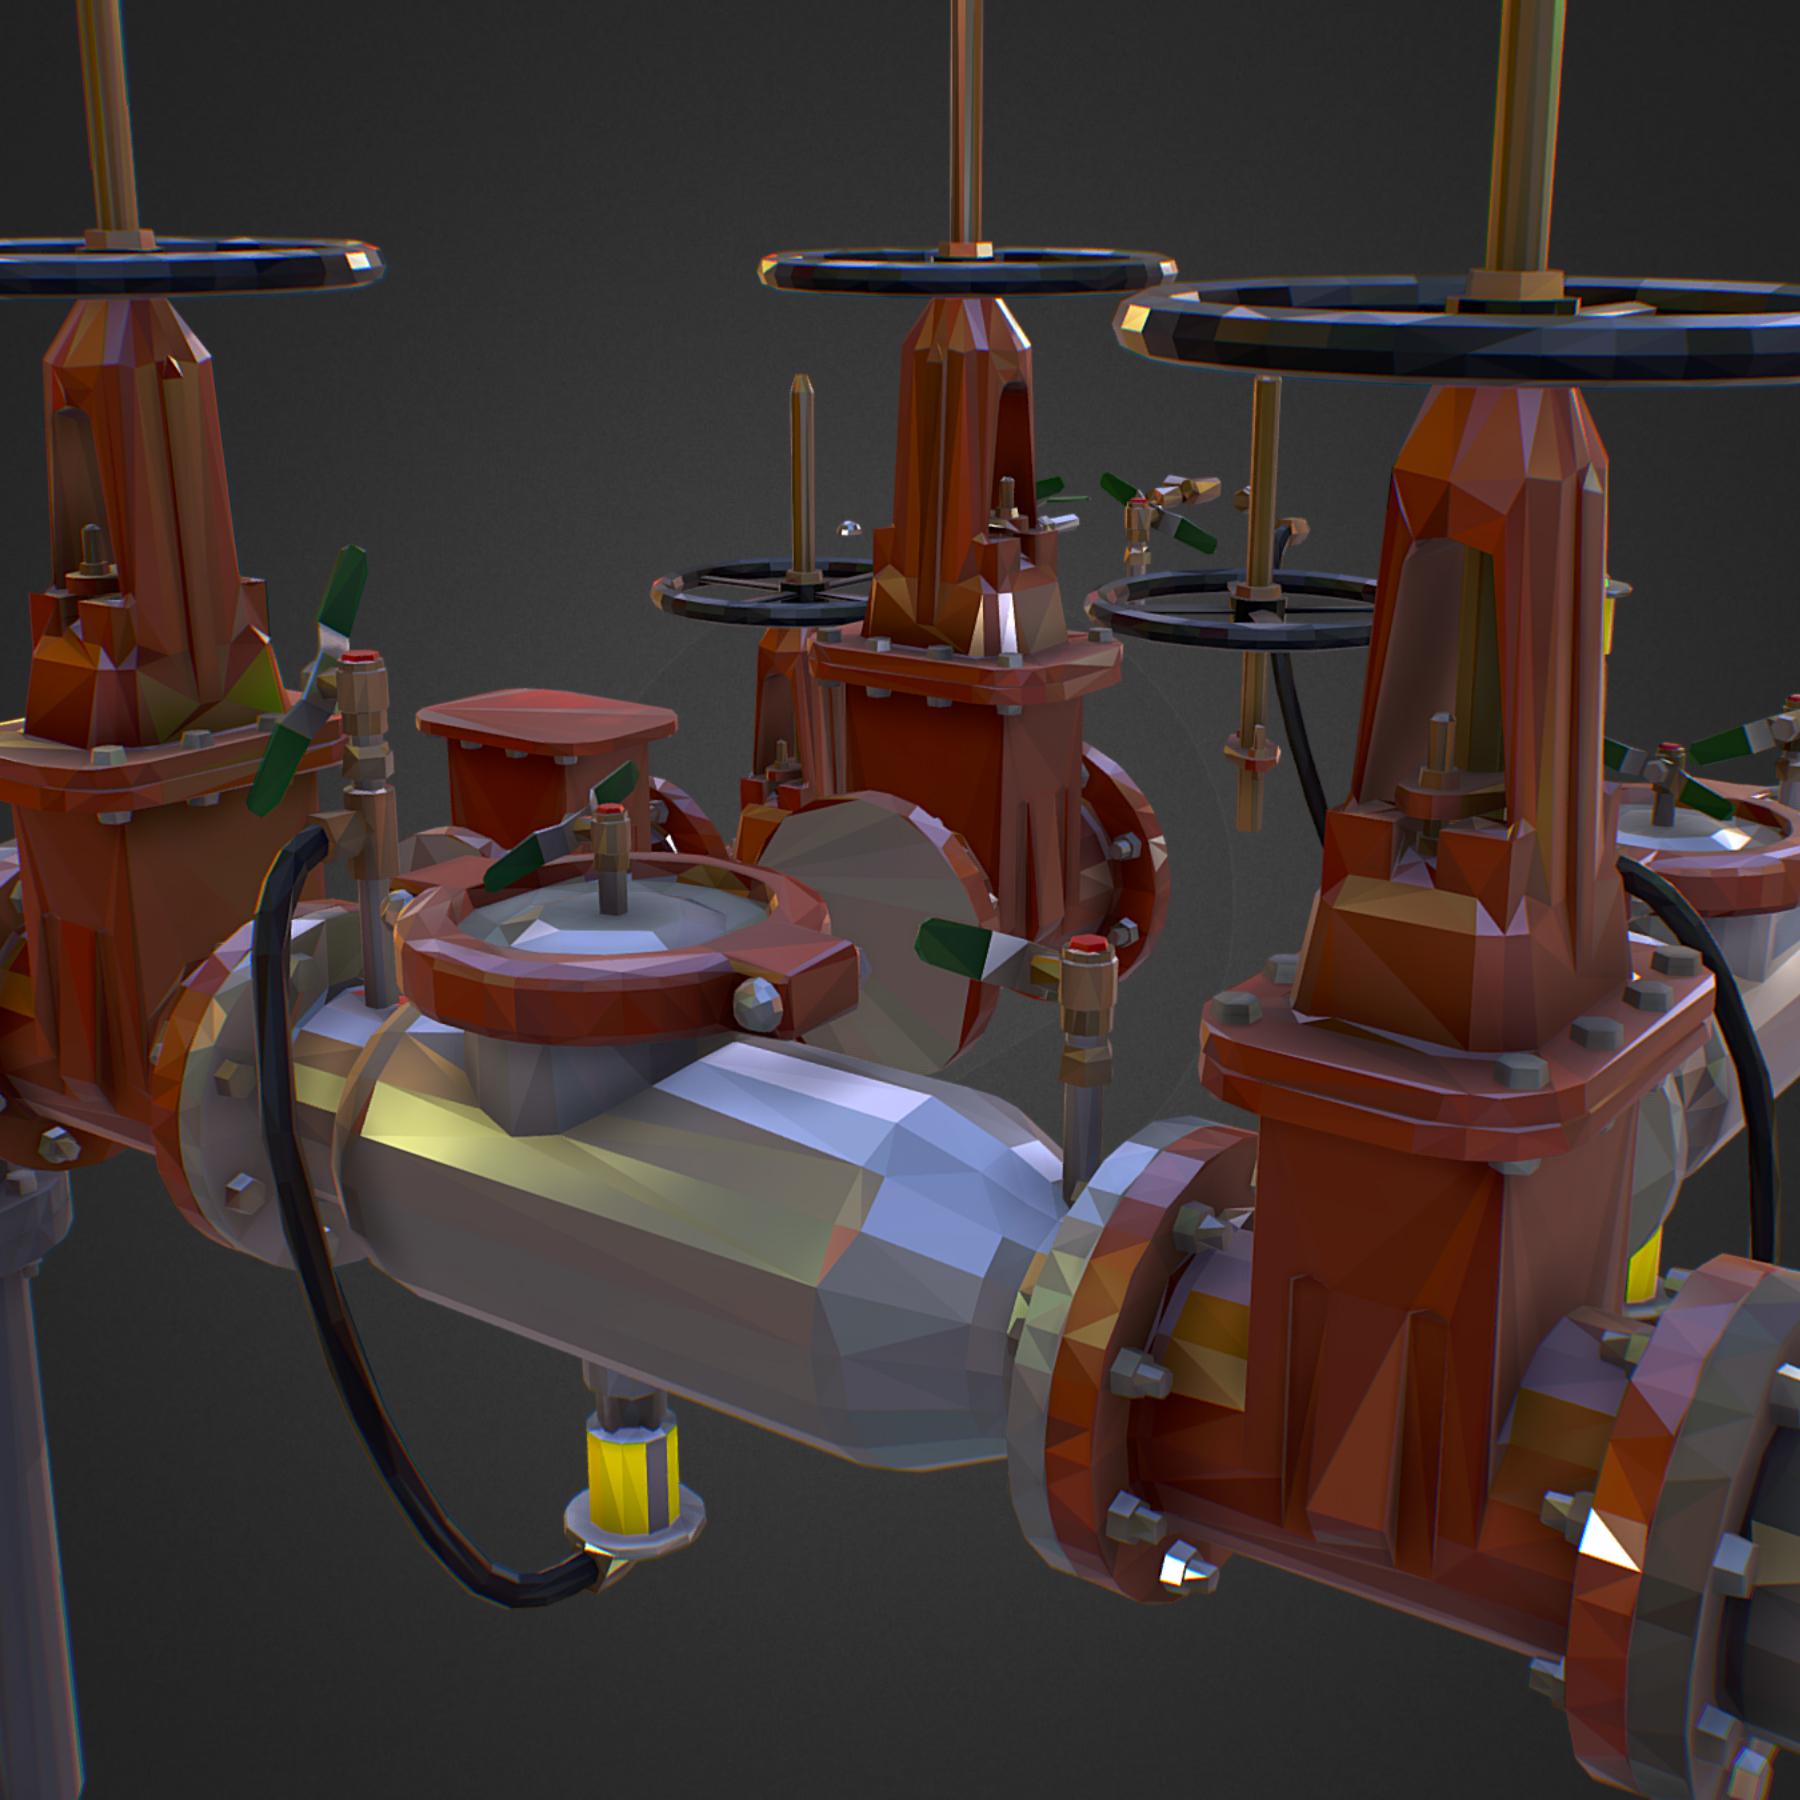 Low Poly ART Backflow Water Pipe Constructor 3d model max 3ds max plugin fbx ma mb tga targa icb vda vst pix obj 272557